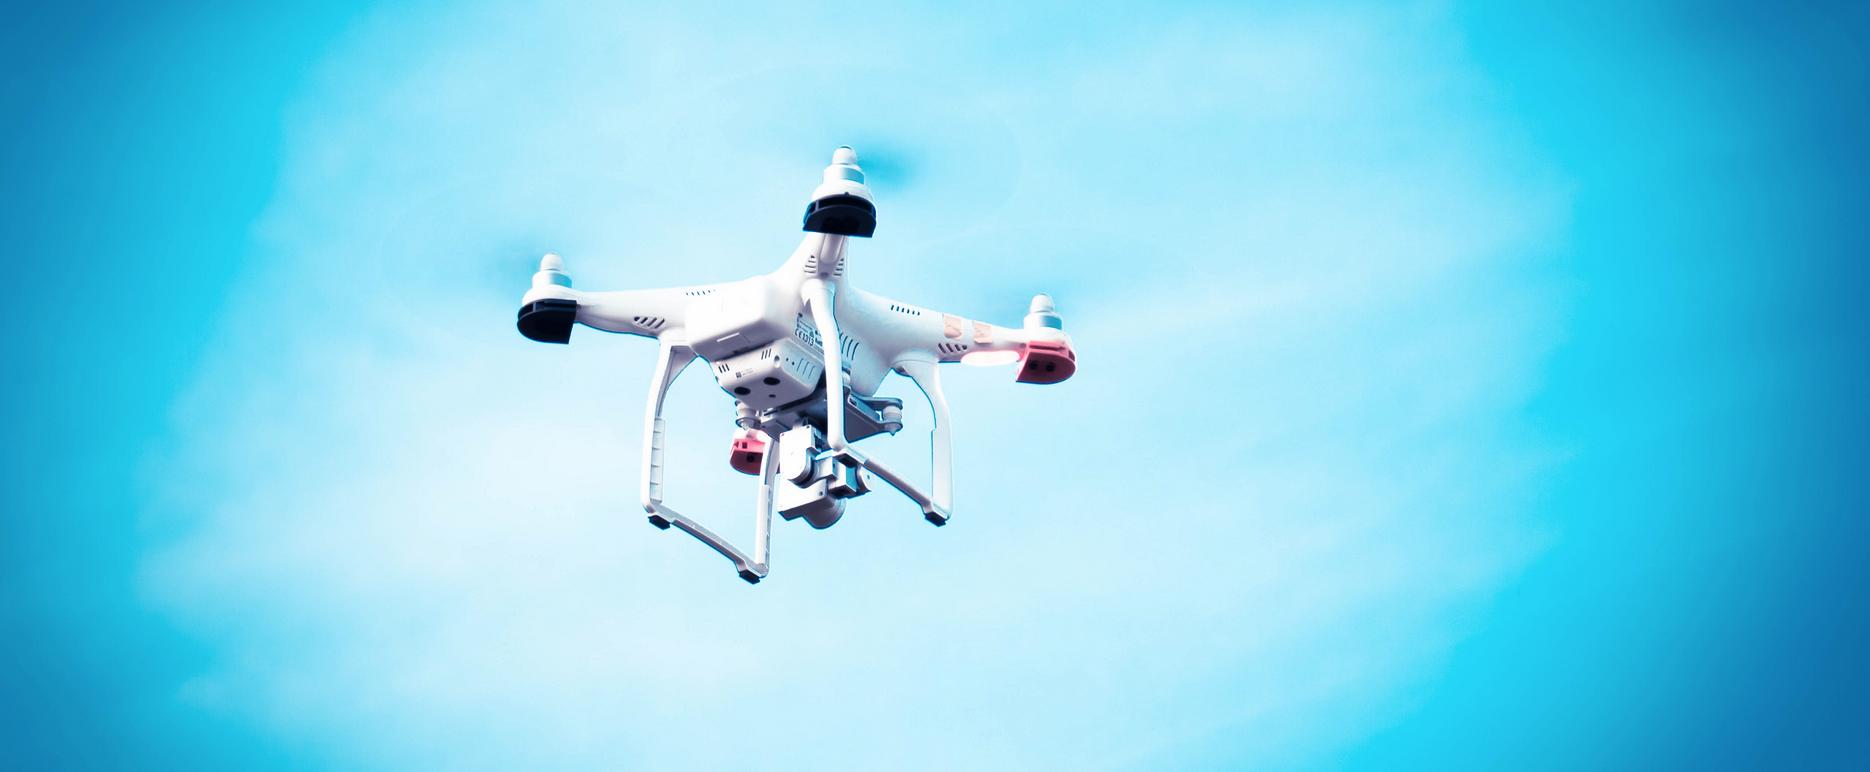 drones regulations construction